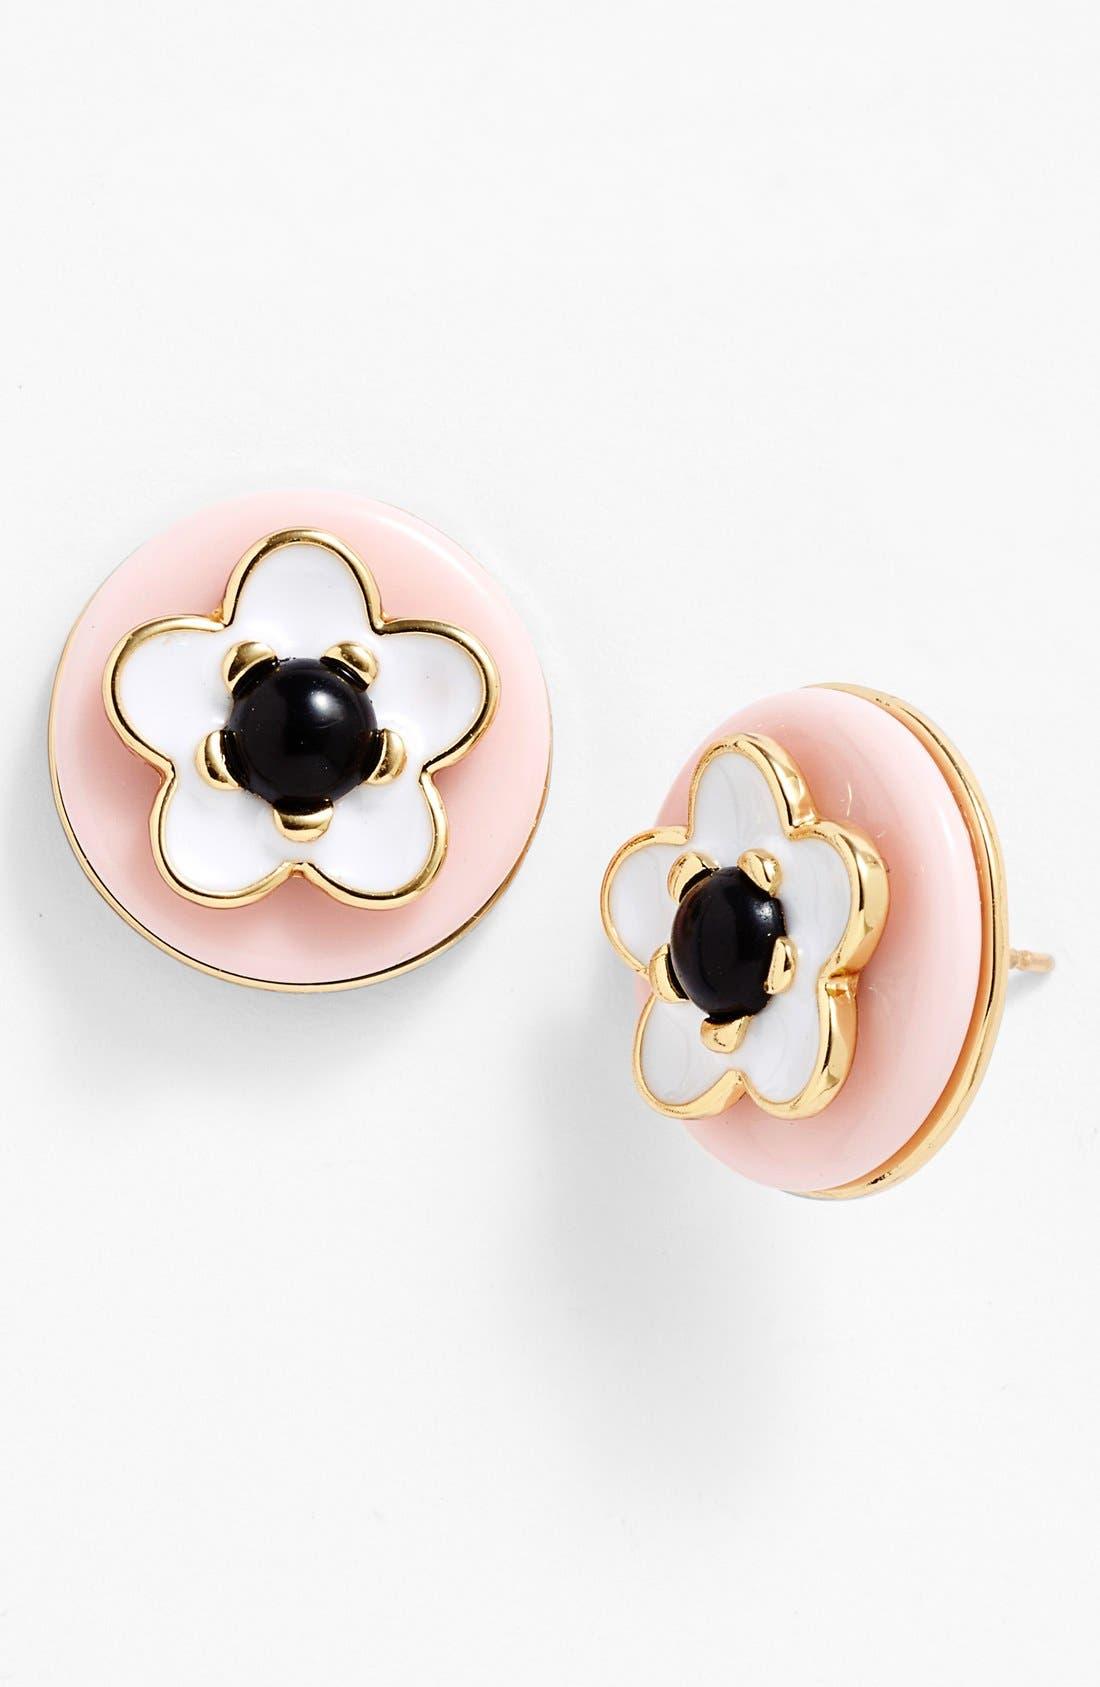 Alternate Image 1 Selected - kate spade new york 'mod flora' stud earrings